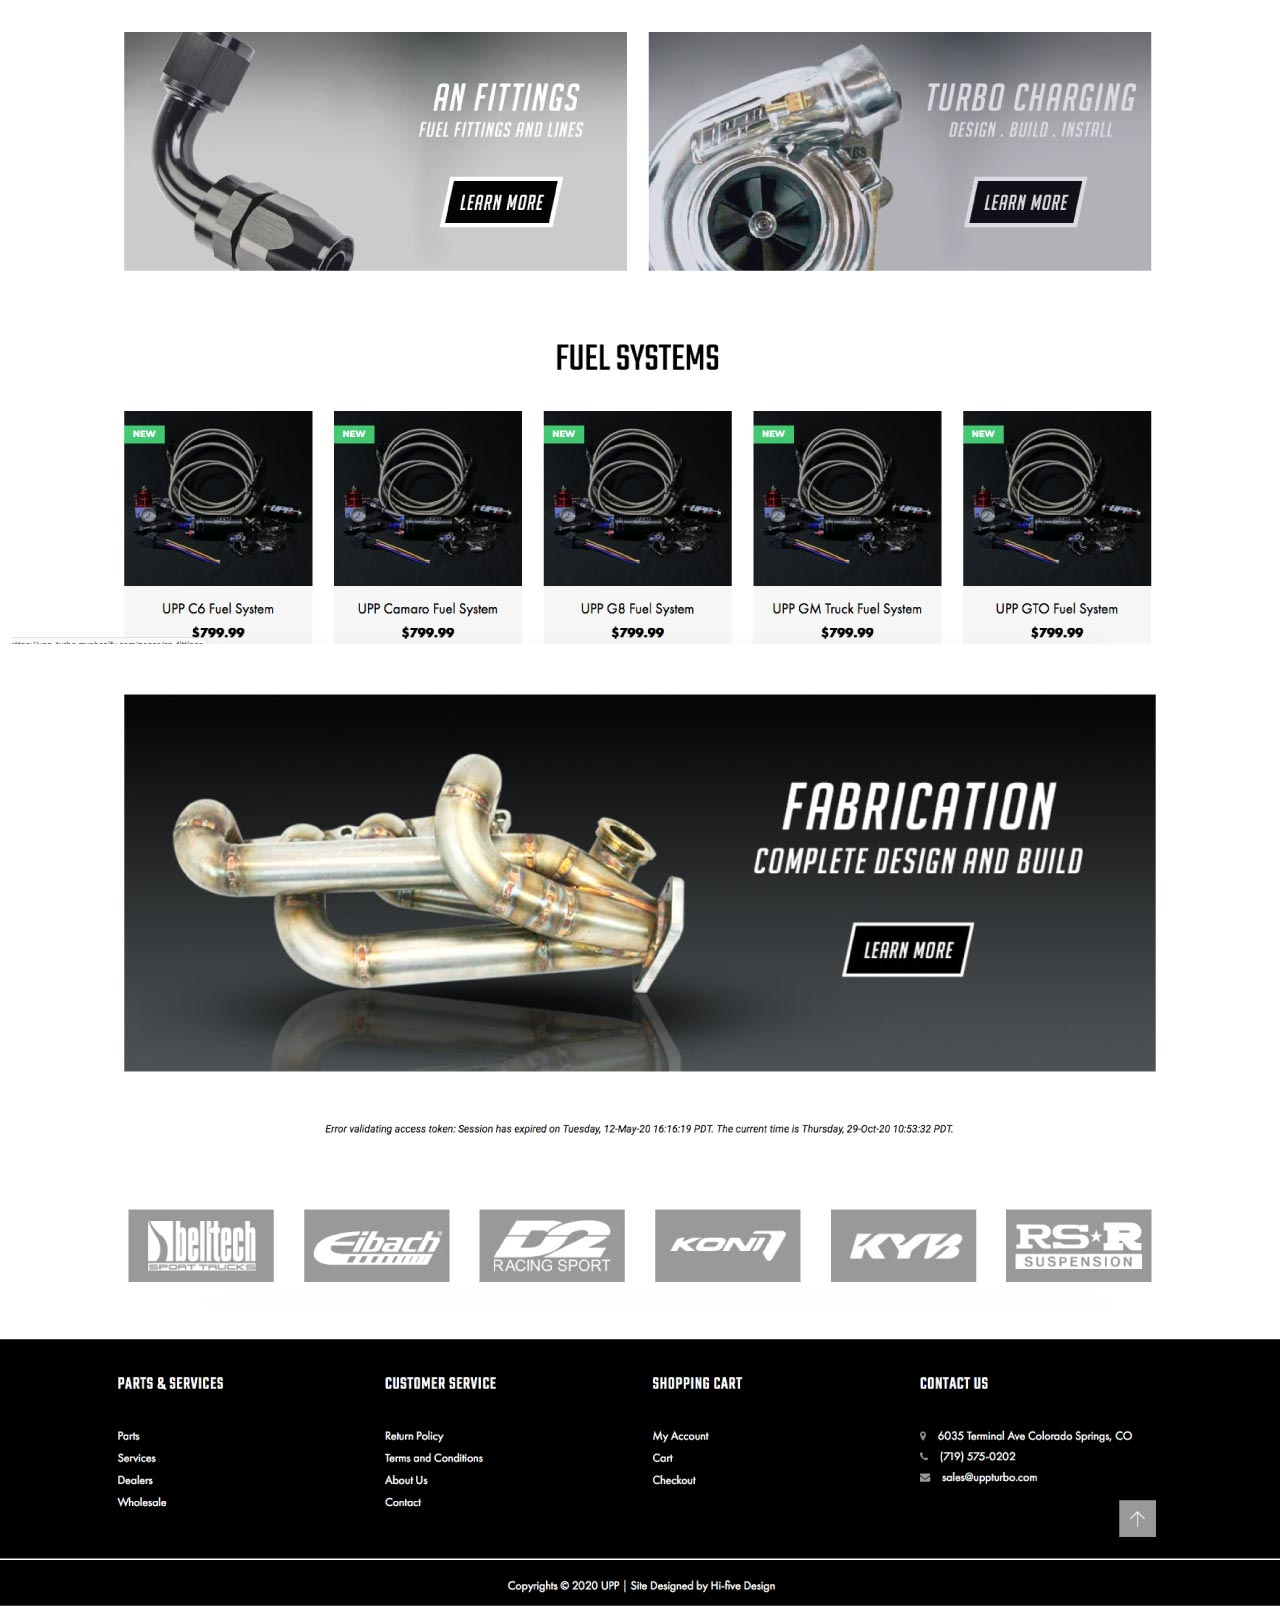 car website design, speed shop website design, auto web design, truck website design, ecommerce website designer colorado springs, web developer colorado springs, best web designer colorado springs